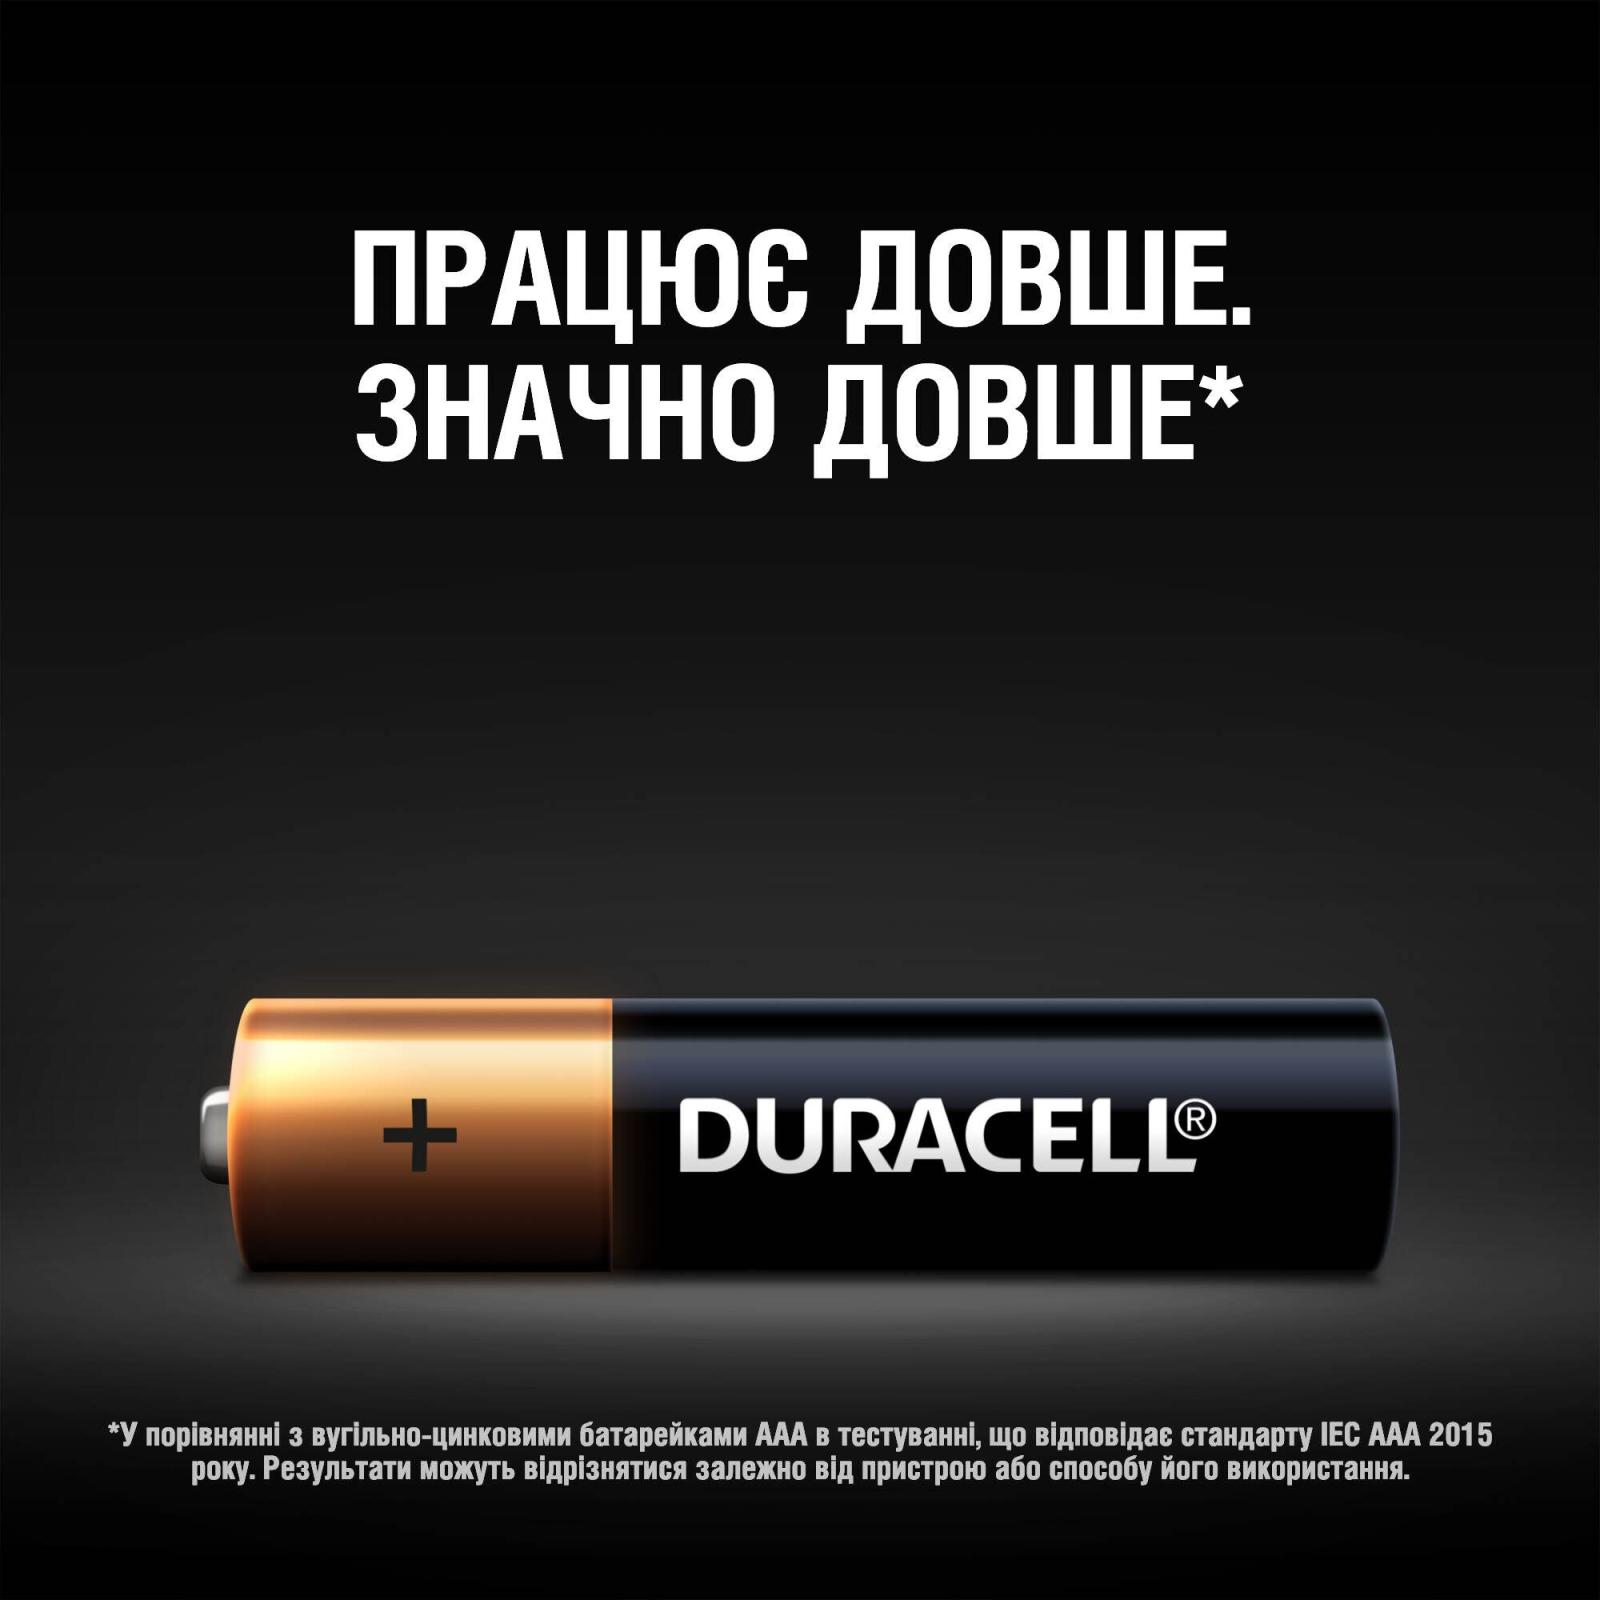 Батарейка Duracell AAA MN2400 LR03 * 6 (5000394107472 / 81483511) изображение 4